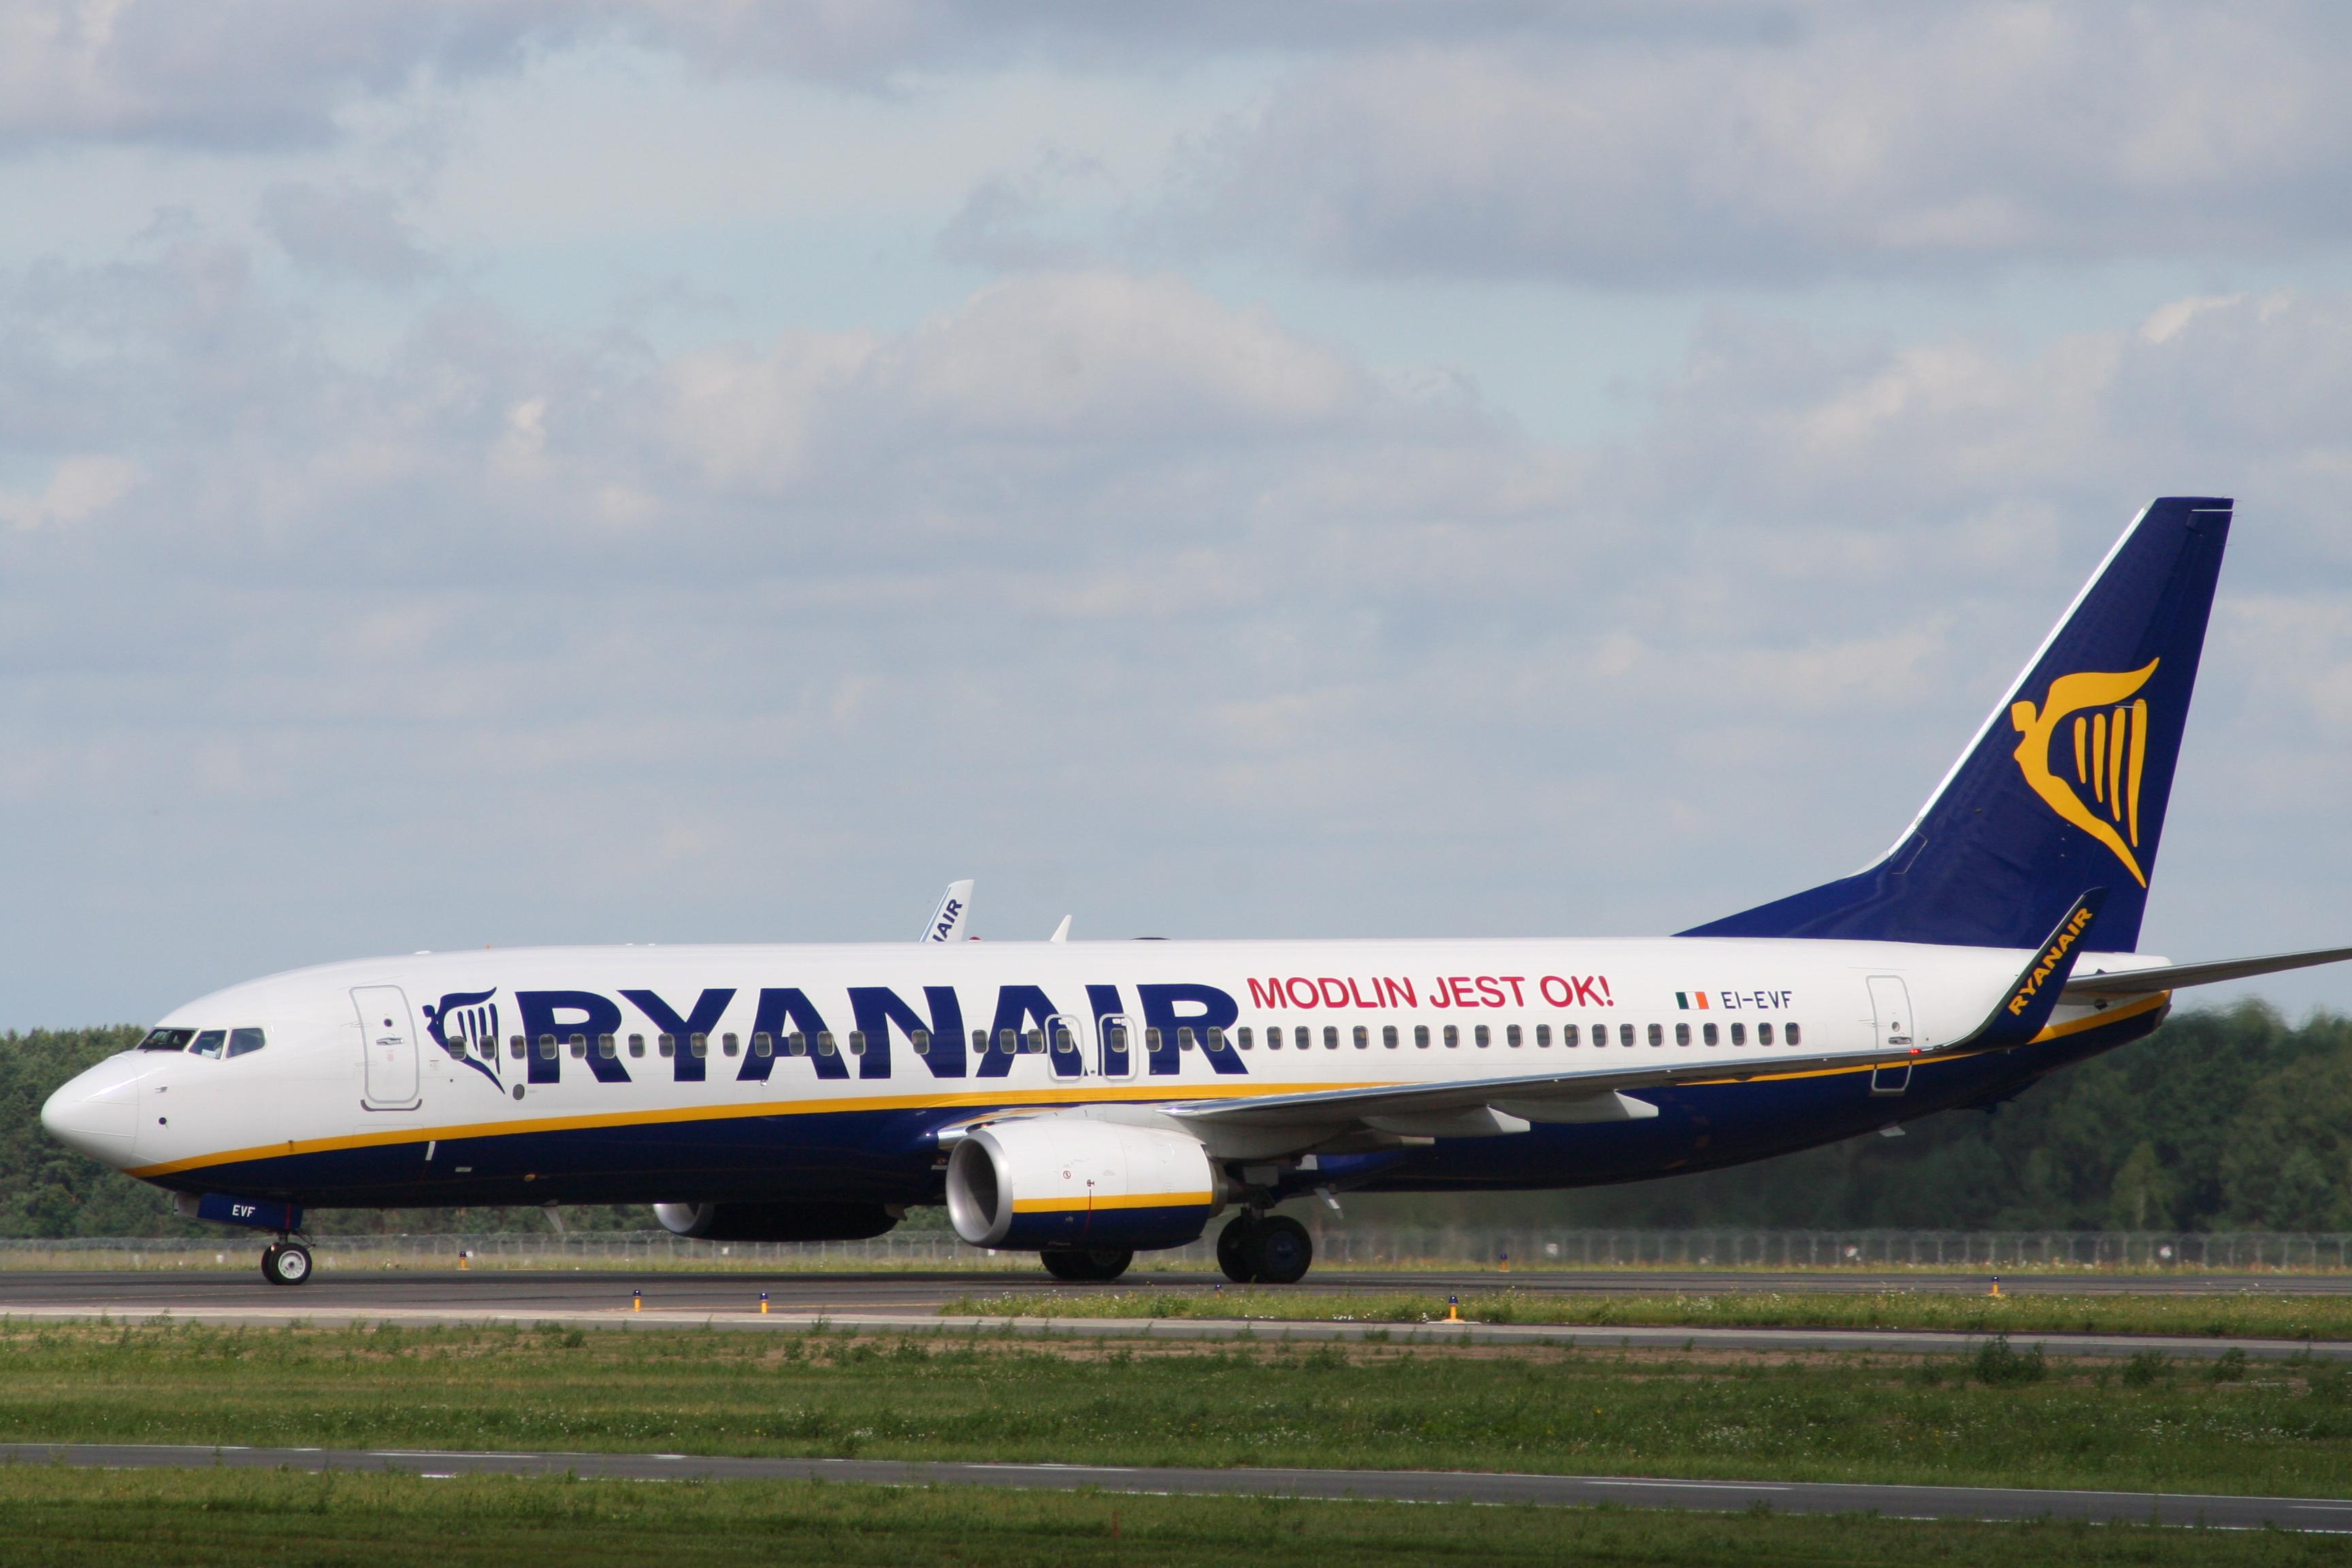 Modlin, Ryanair